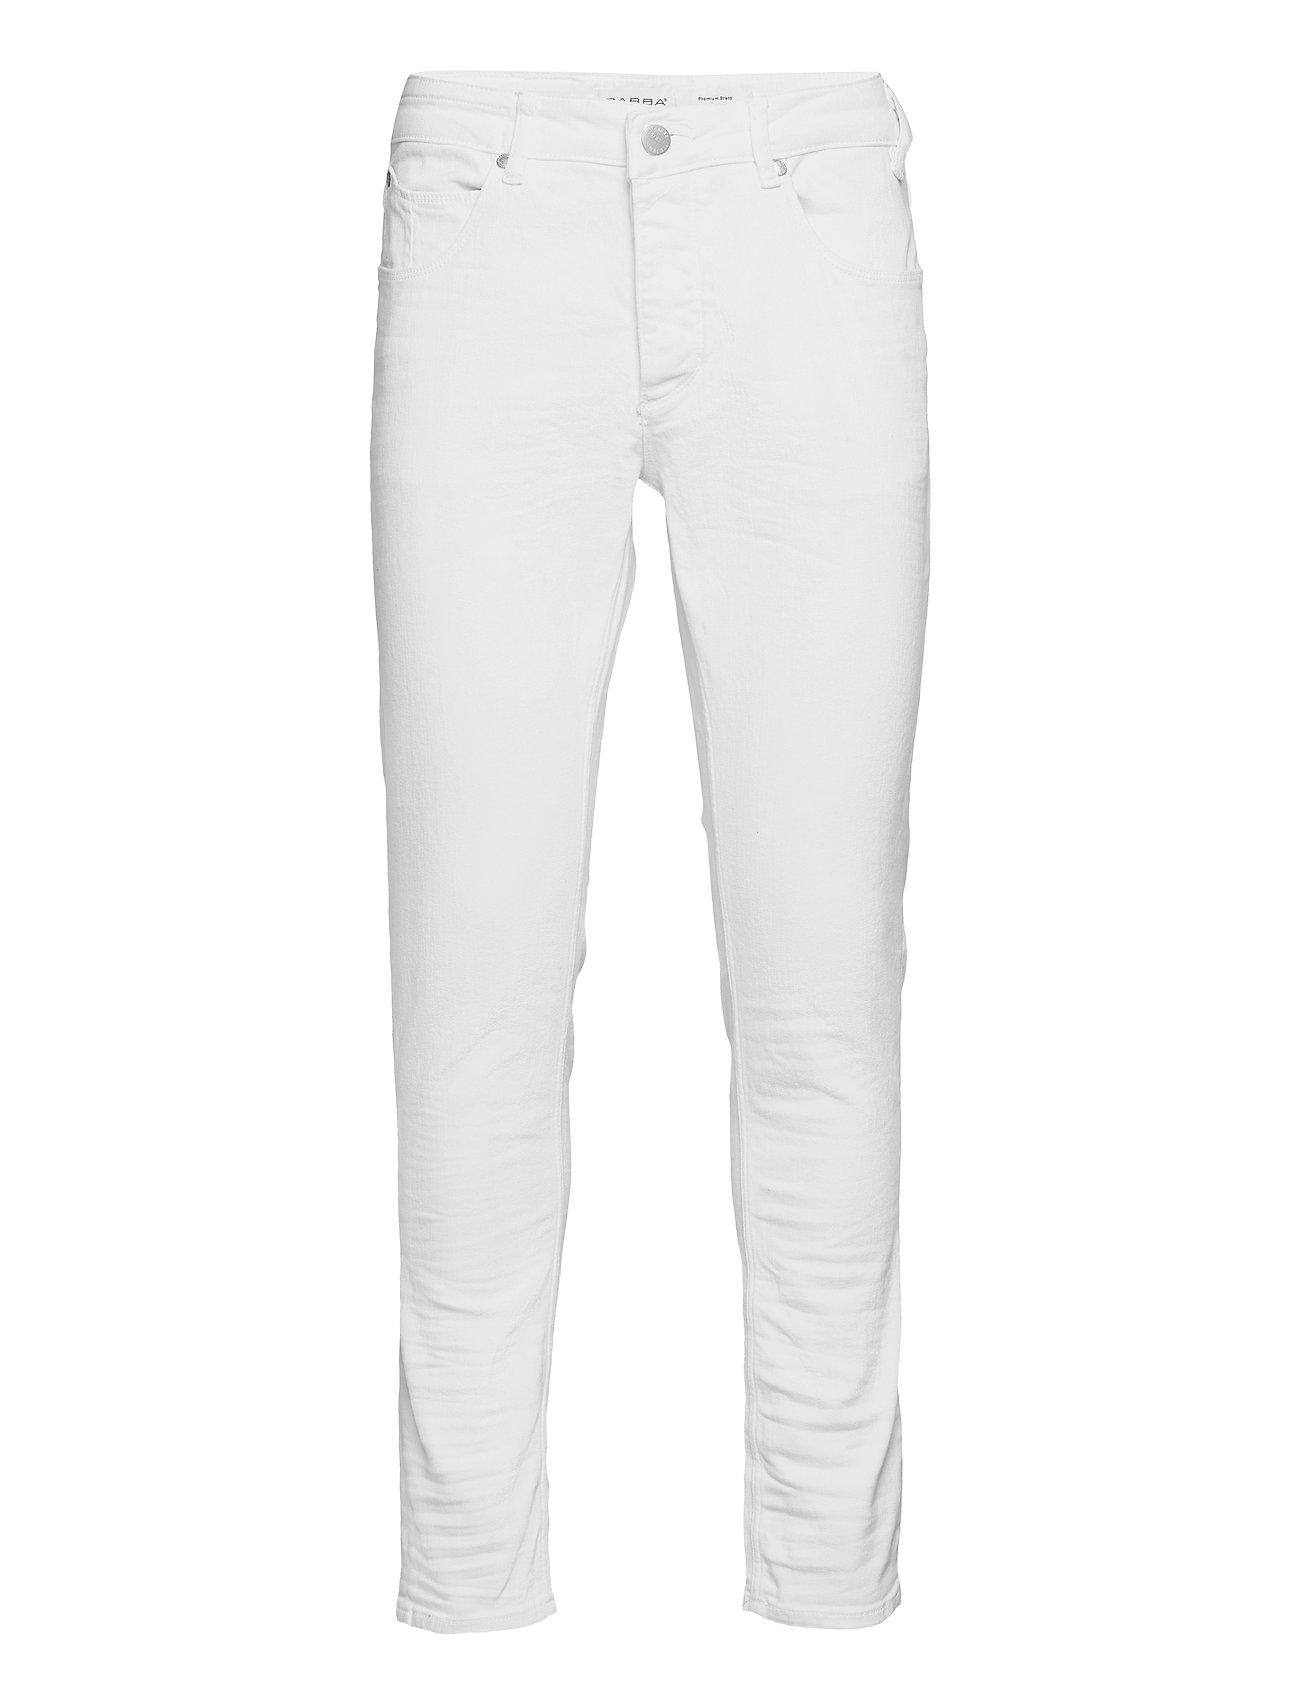 Image of Rey K2671 Jeans Slim Jeans Hvid Gabba (3498386937)